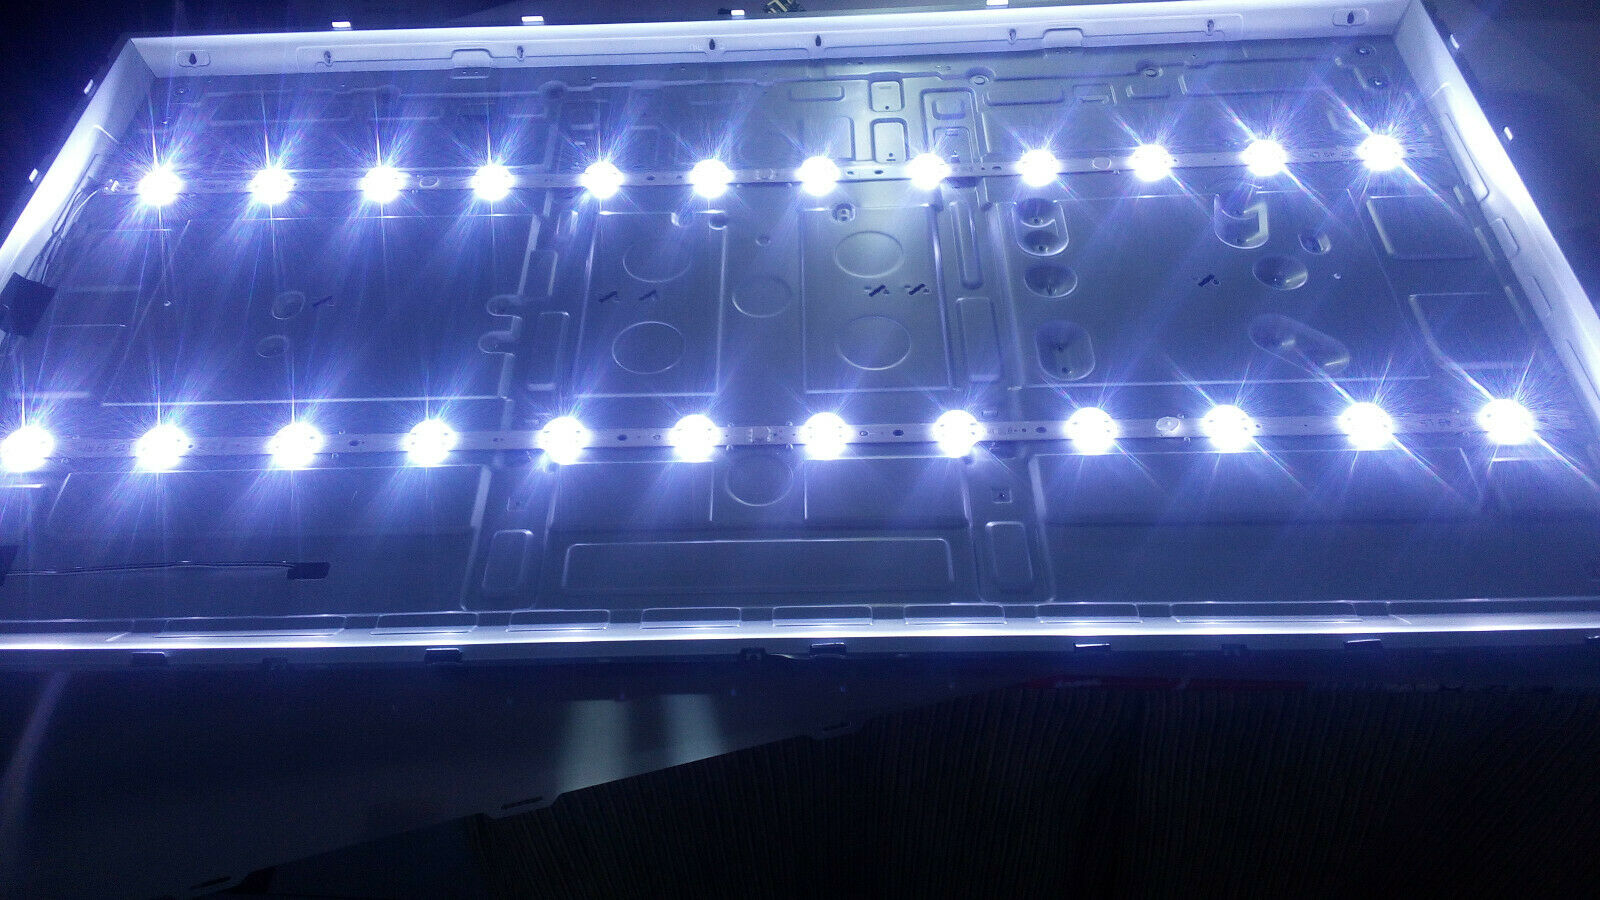 4pcs LED TV  For LG 6916L-2862A 6916L-2863A V17 49 L1 R1 49UV340C 49UJ6565    100%NEW